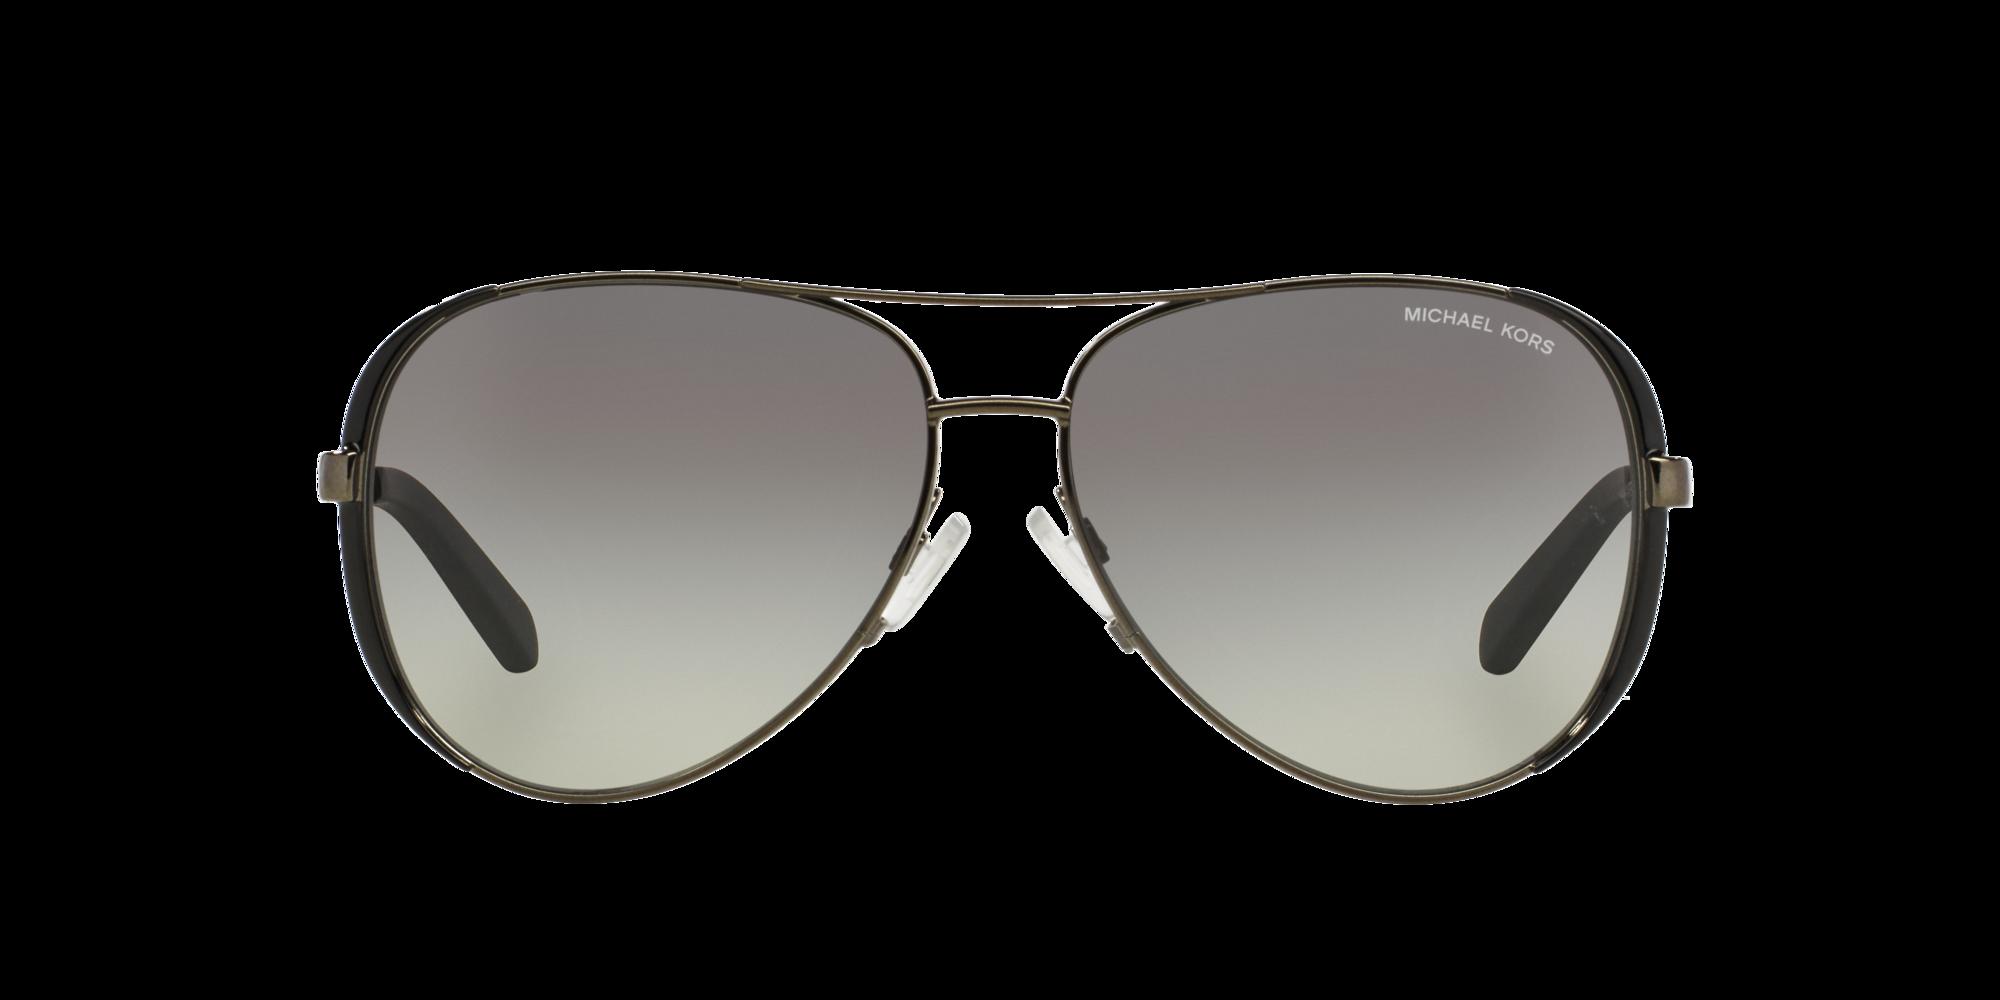 Image for MK5004 59 CHELSEA from LensCrafters | Glasses, Prescription Glasses Online, Eyewear